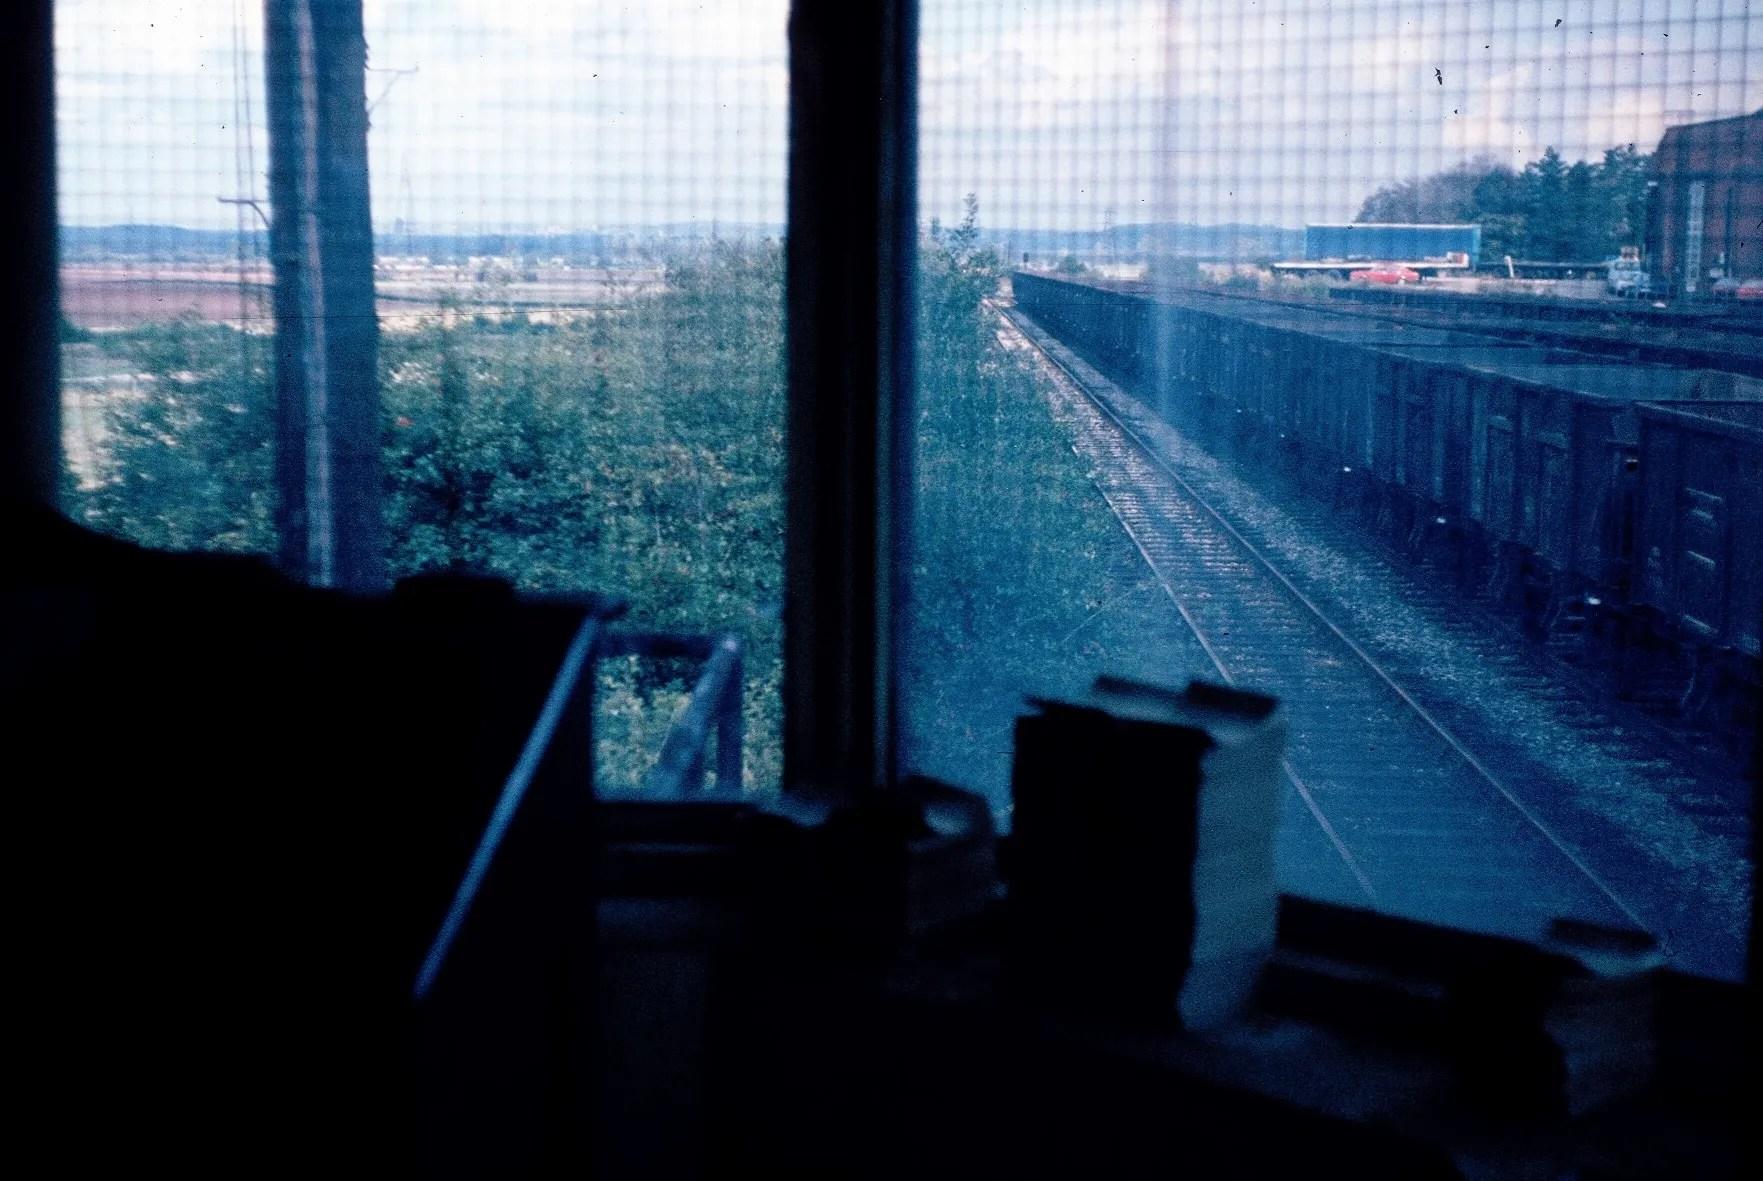 Rushcliff Halt Signal Box - 1981 - railway photographs